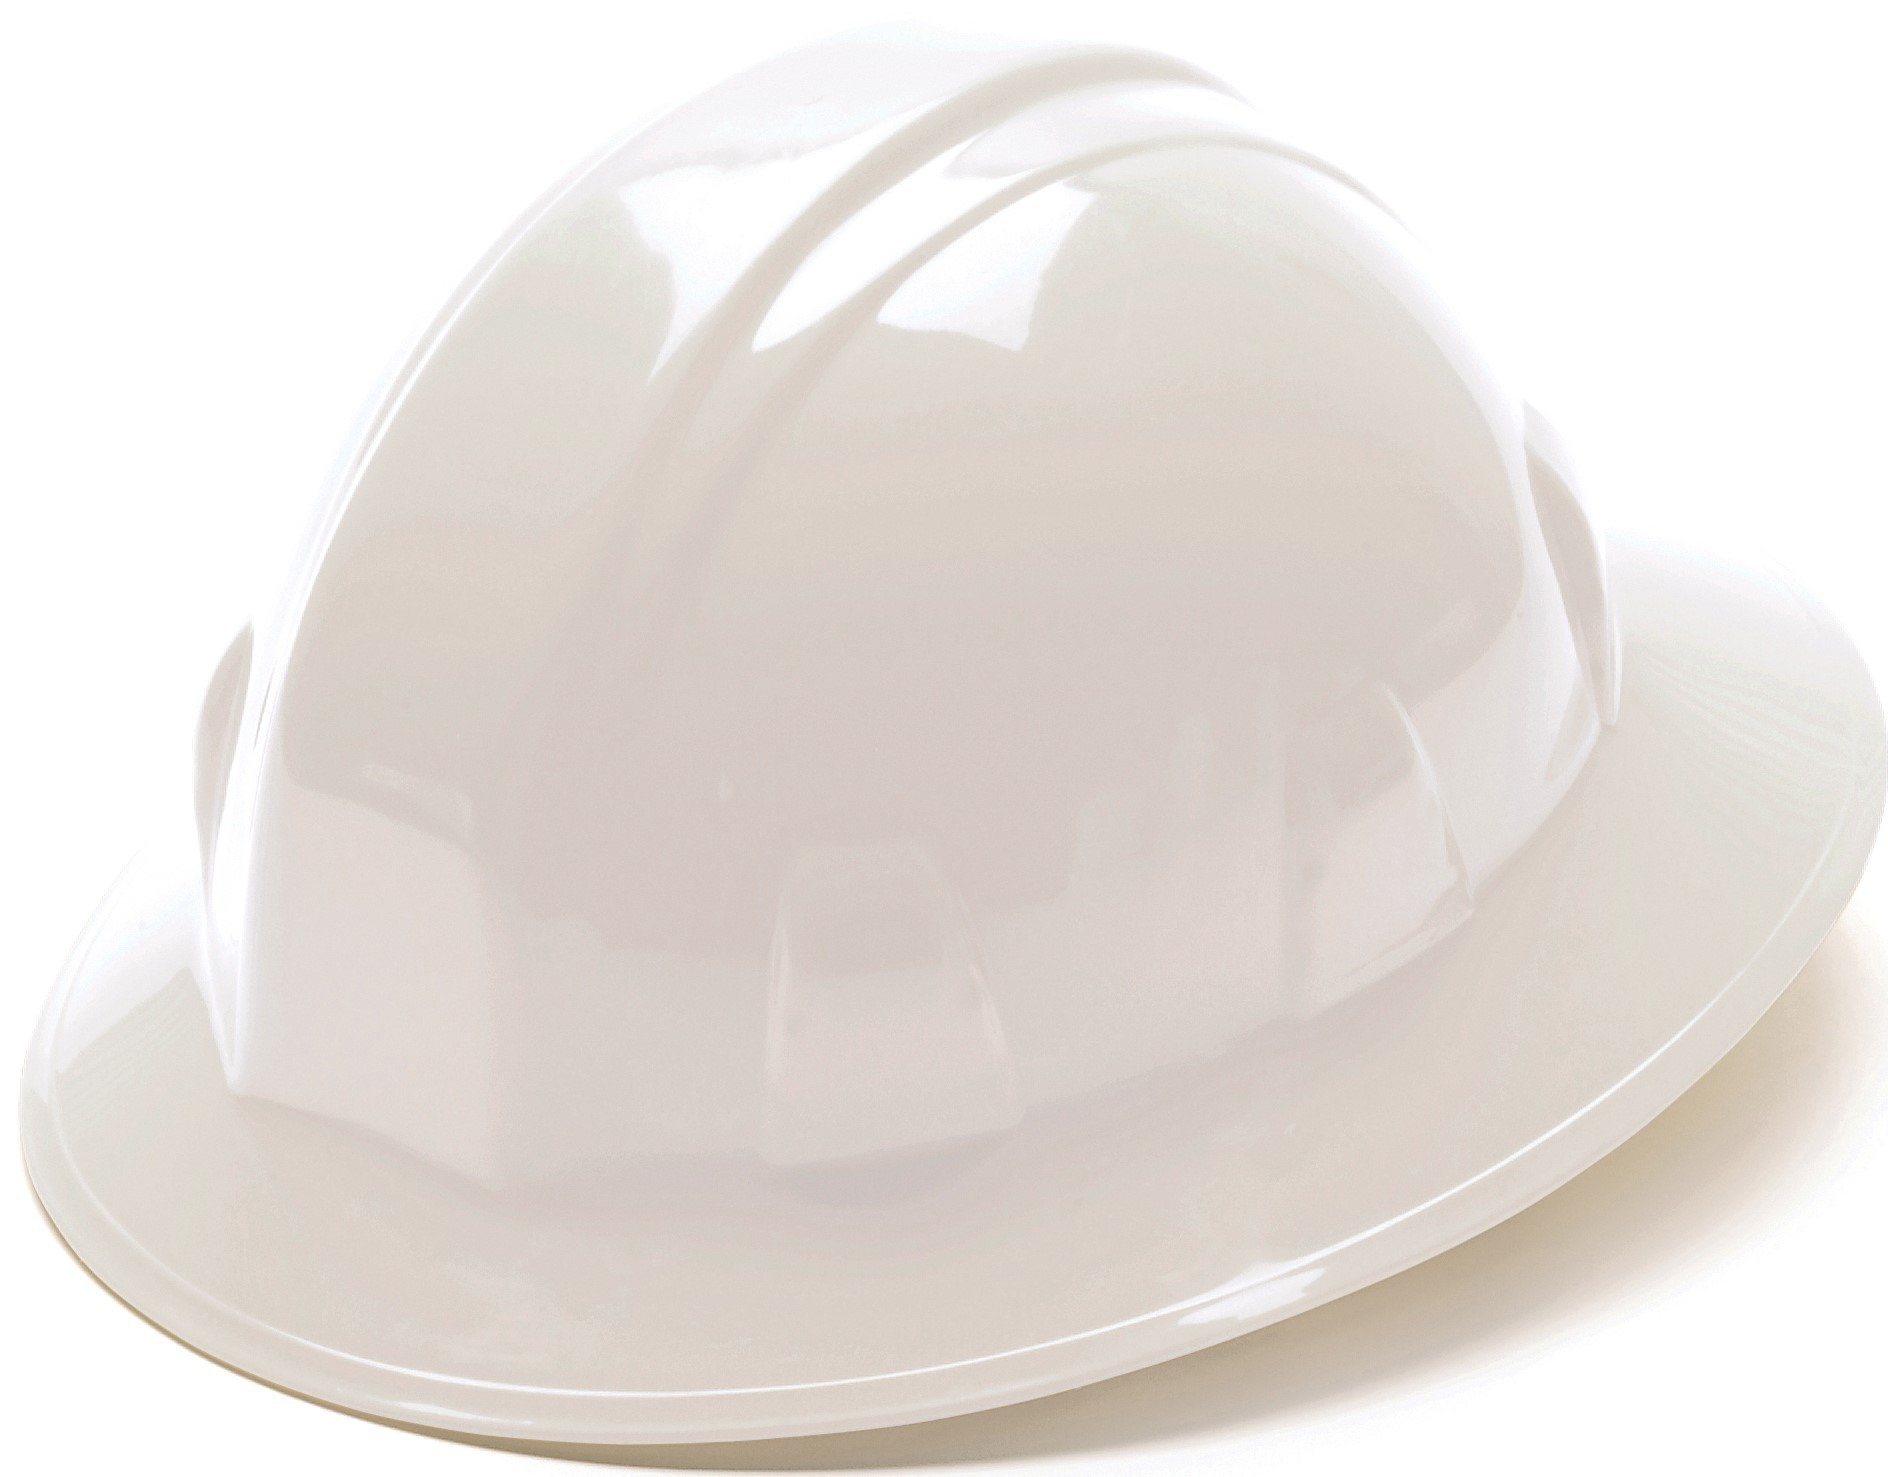 Pyramex White Full Brim Style 4 Point Ratchet Suspension Hard Hat